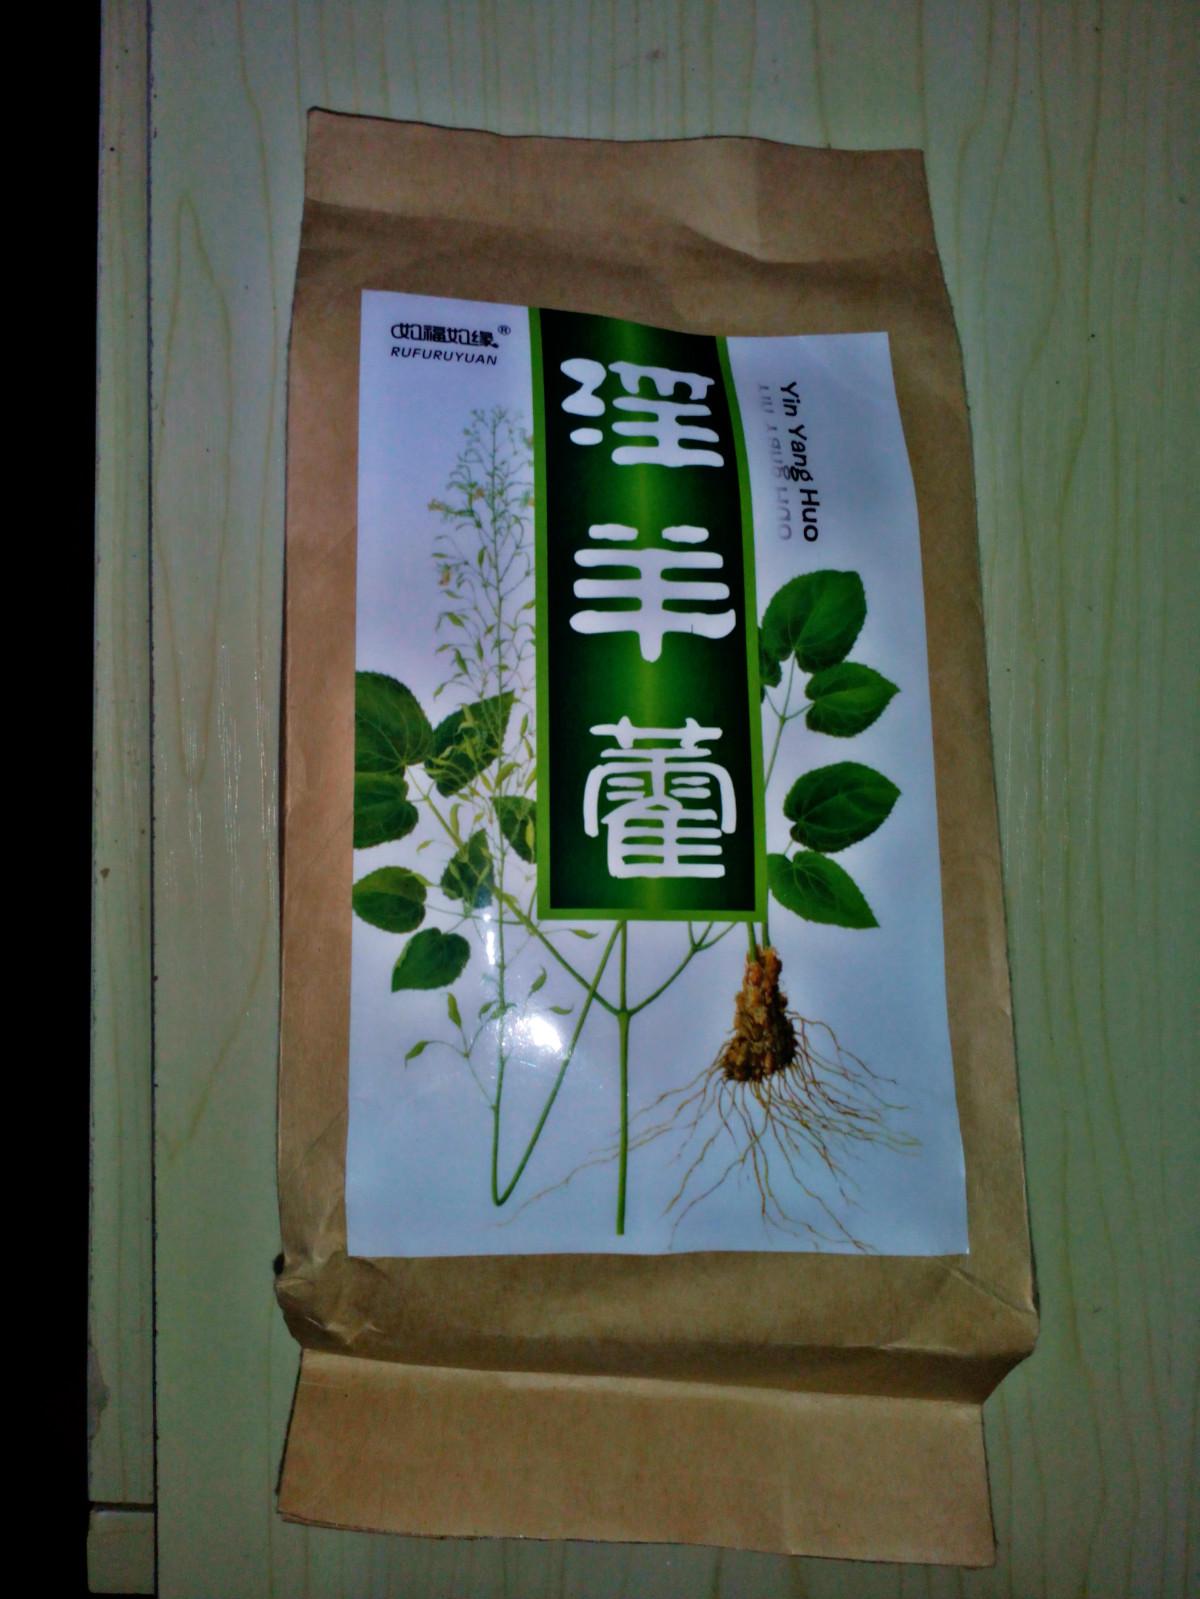 Chinese herbs like viagra